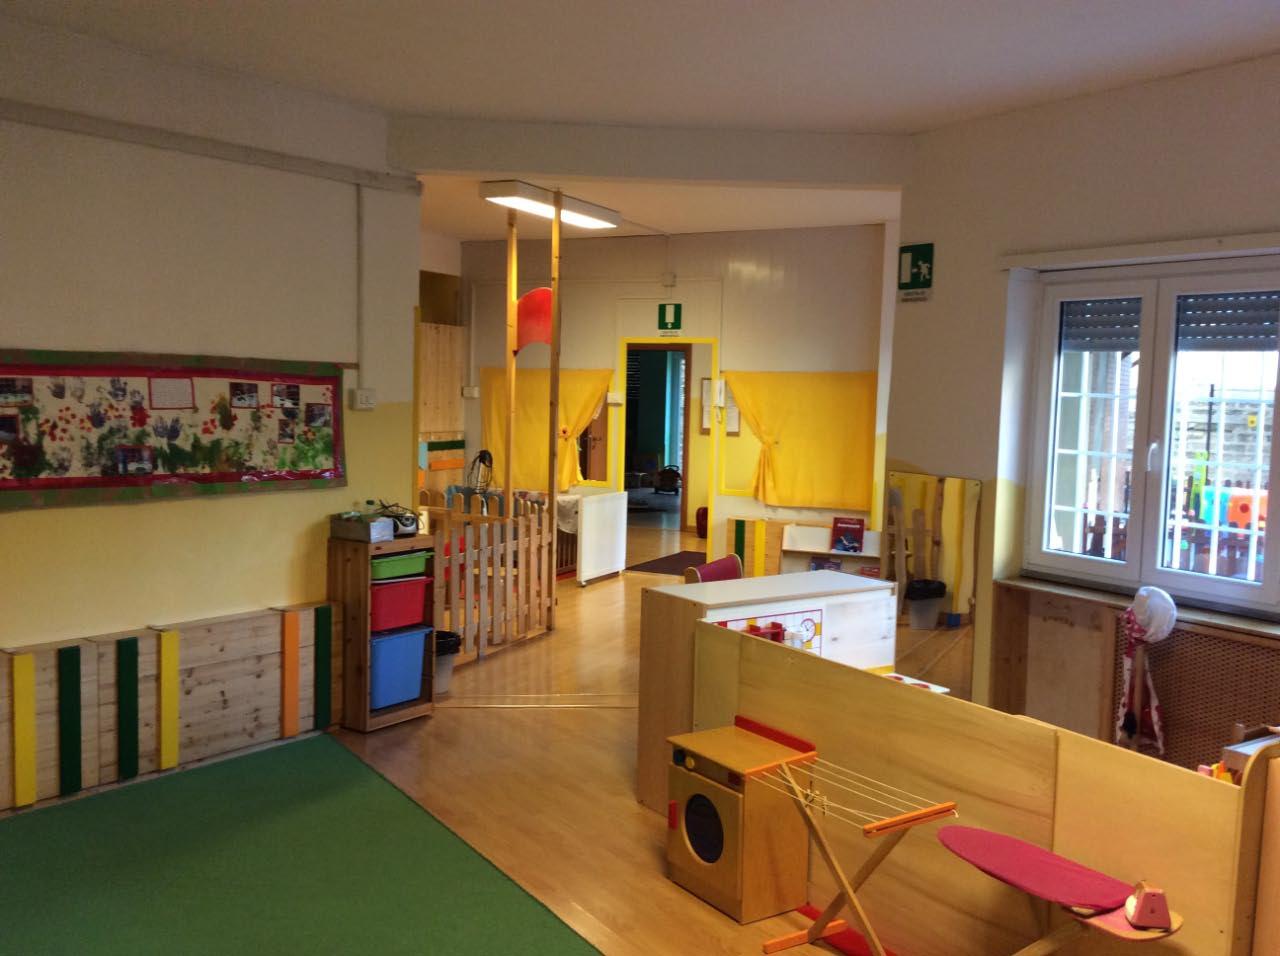 asilo nido privato paradiso d'infanzia nuovo salario roma nord